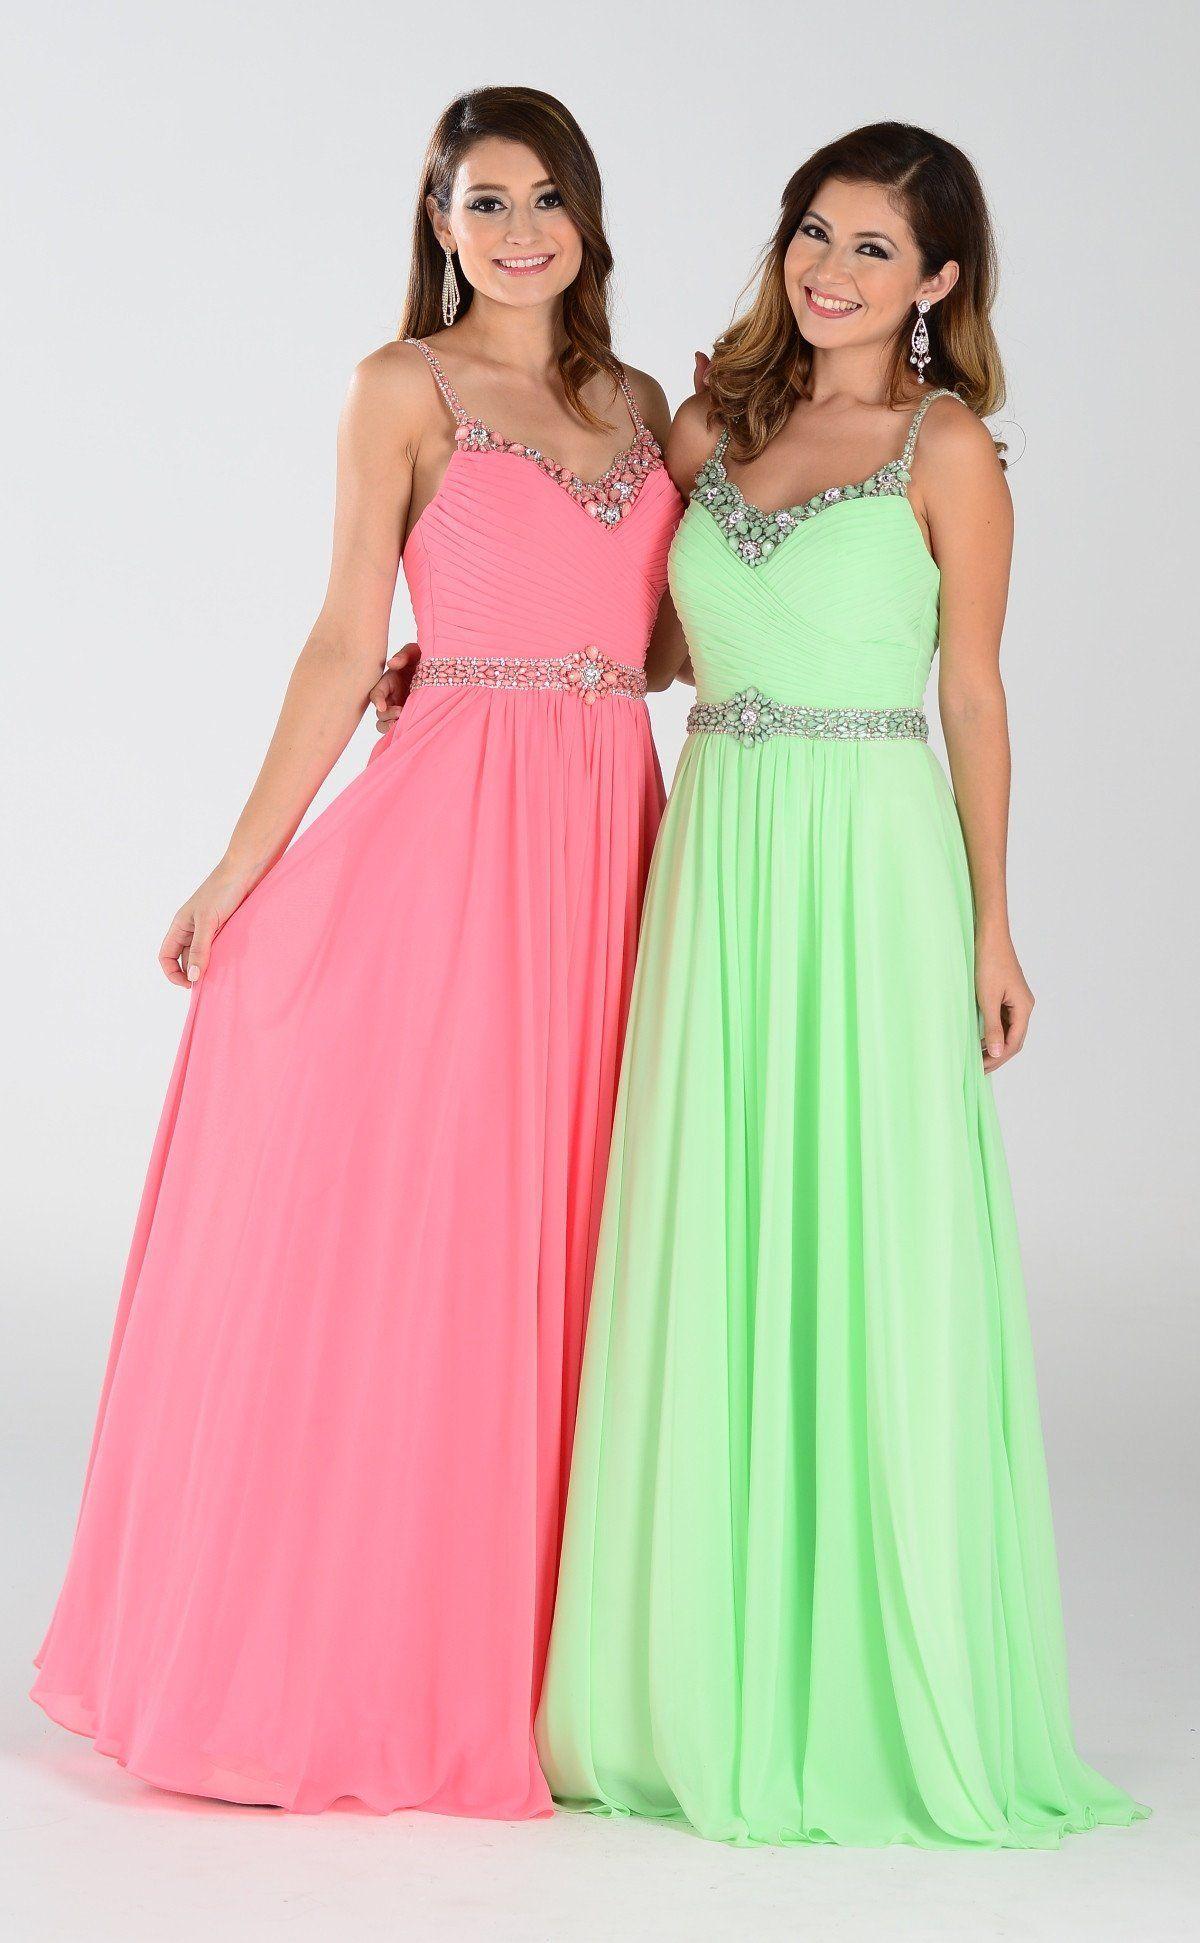 Long Chiffon Bridesmaid Dress 101-7408 - CLOSEOUT | Products